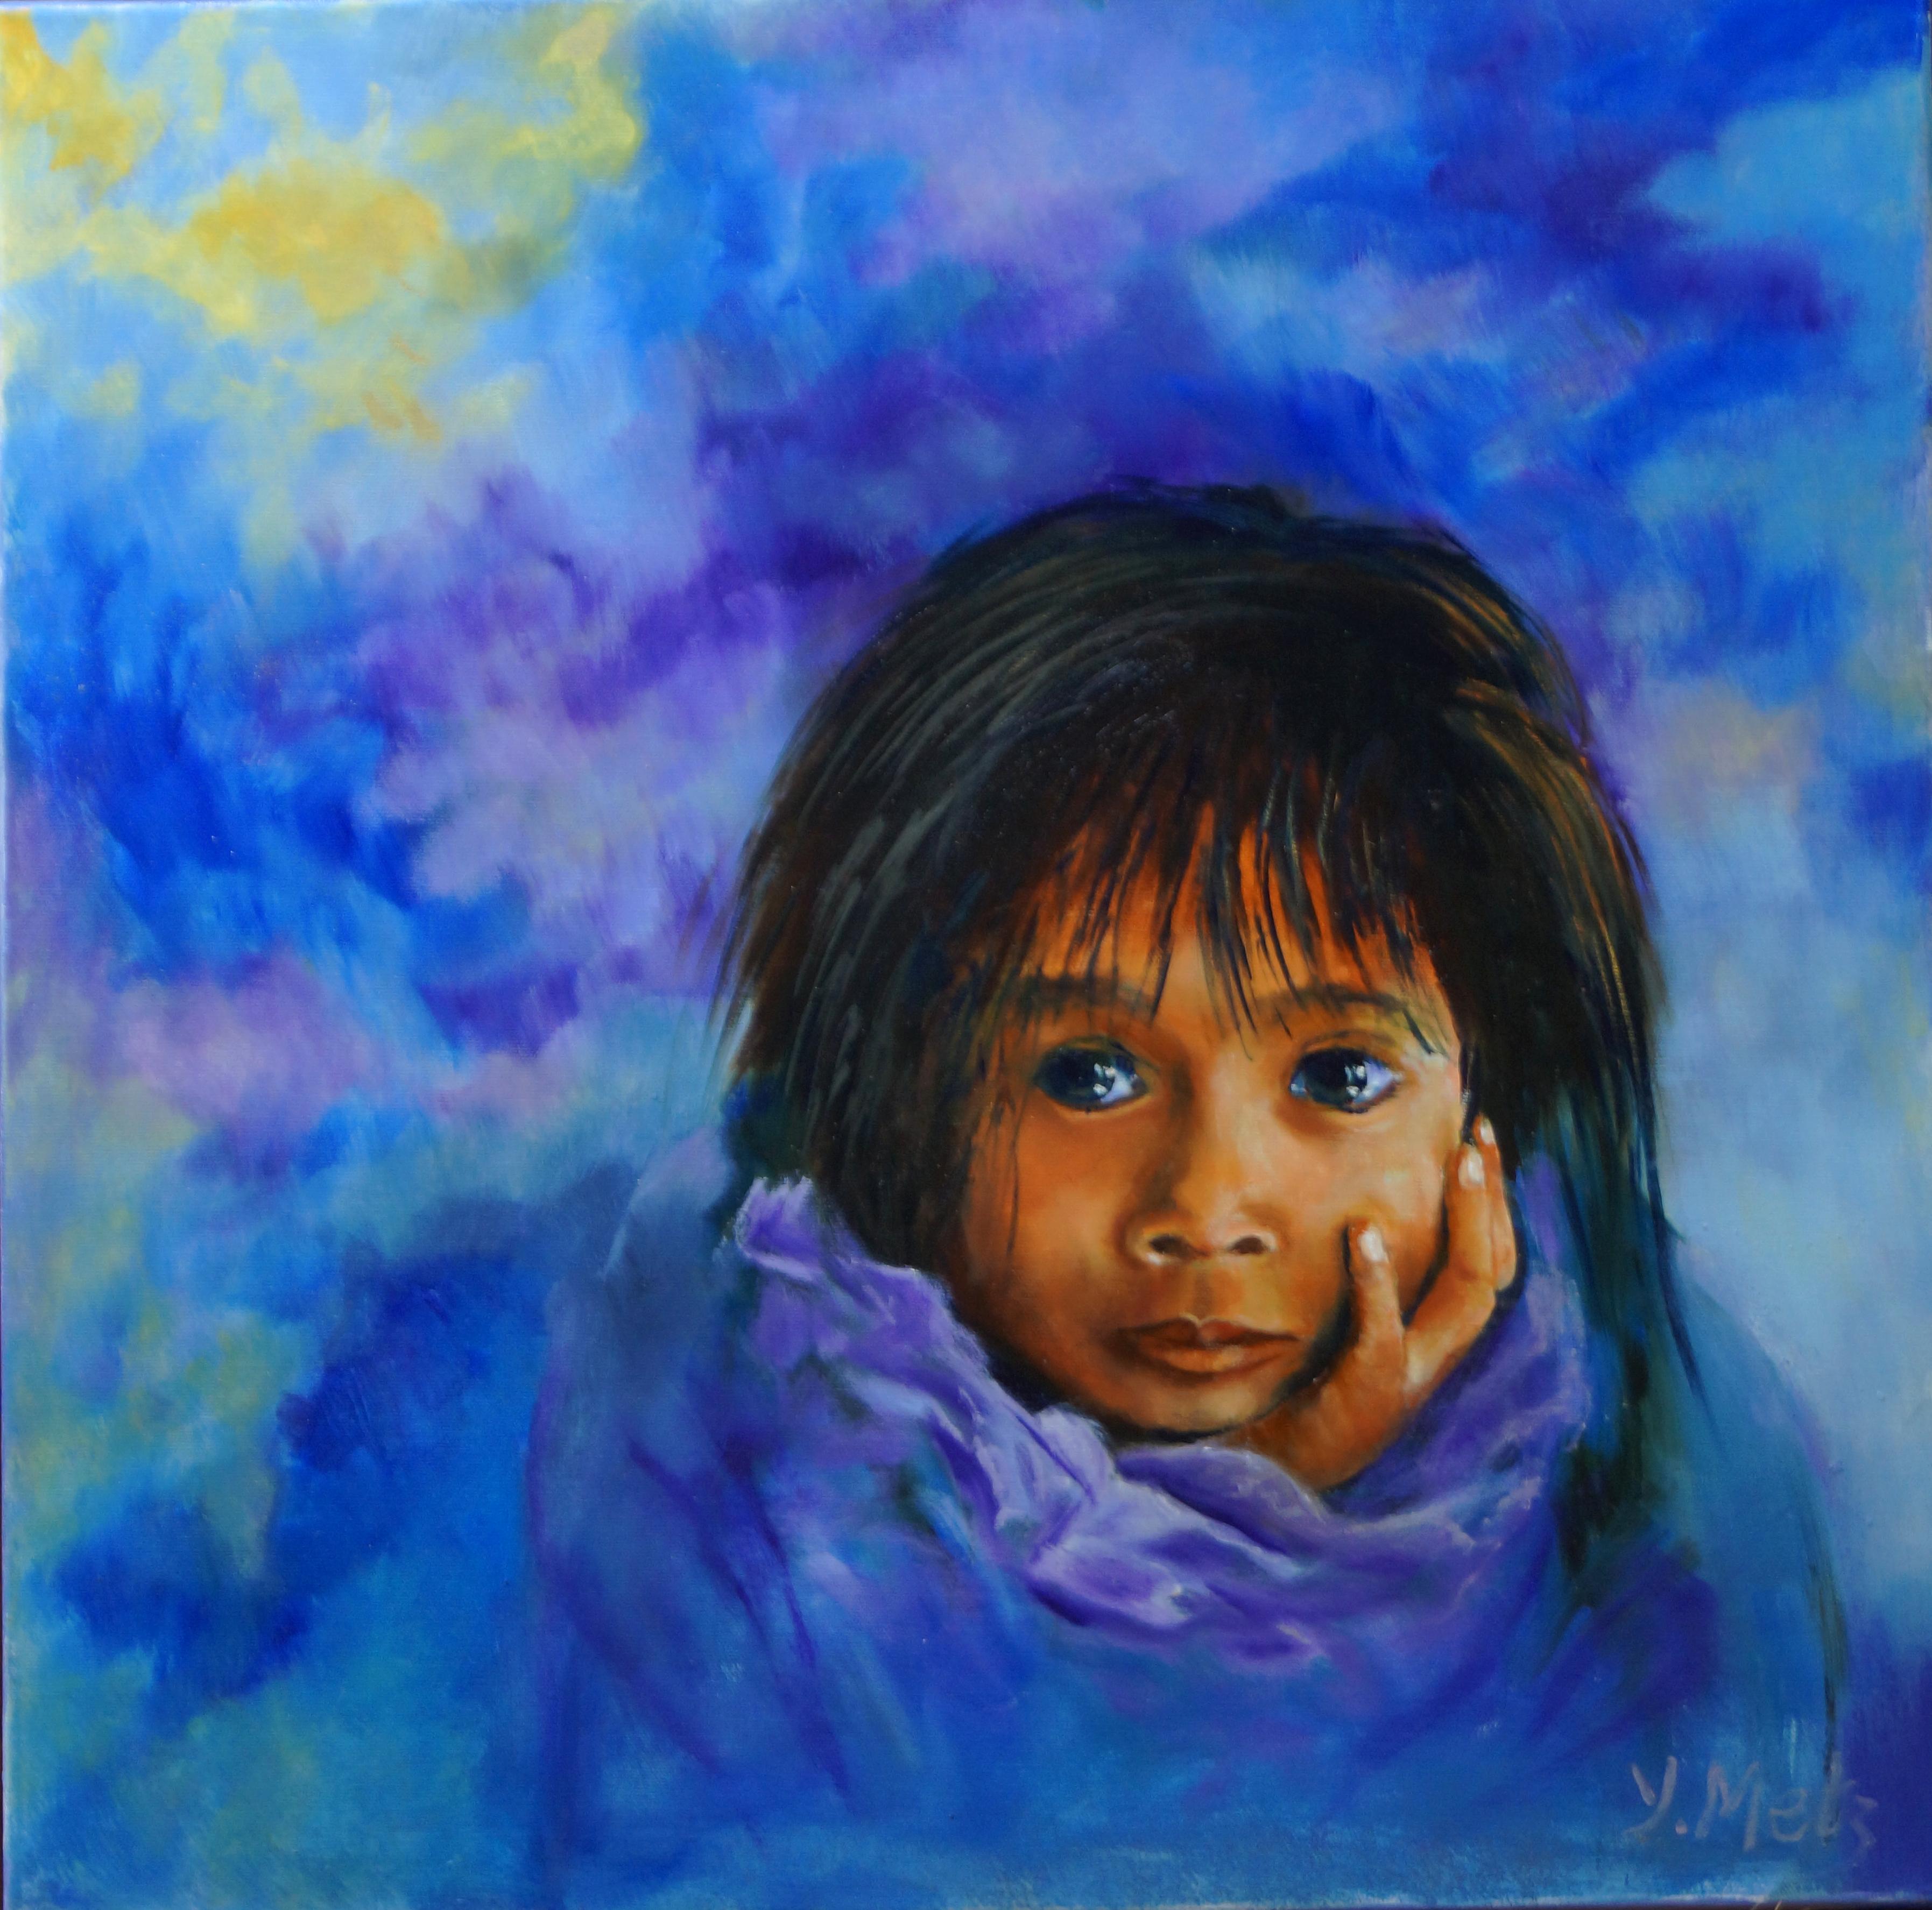 Méditation 2 – Yvette METZ Artiste Peintre